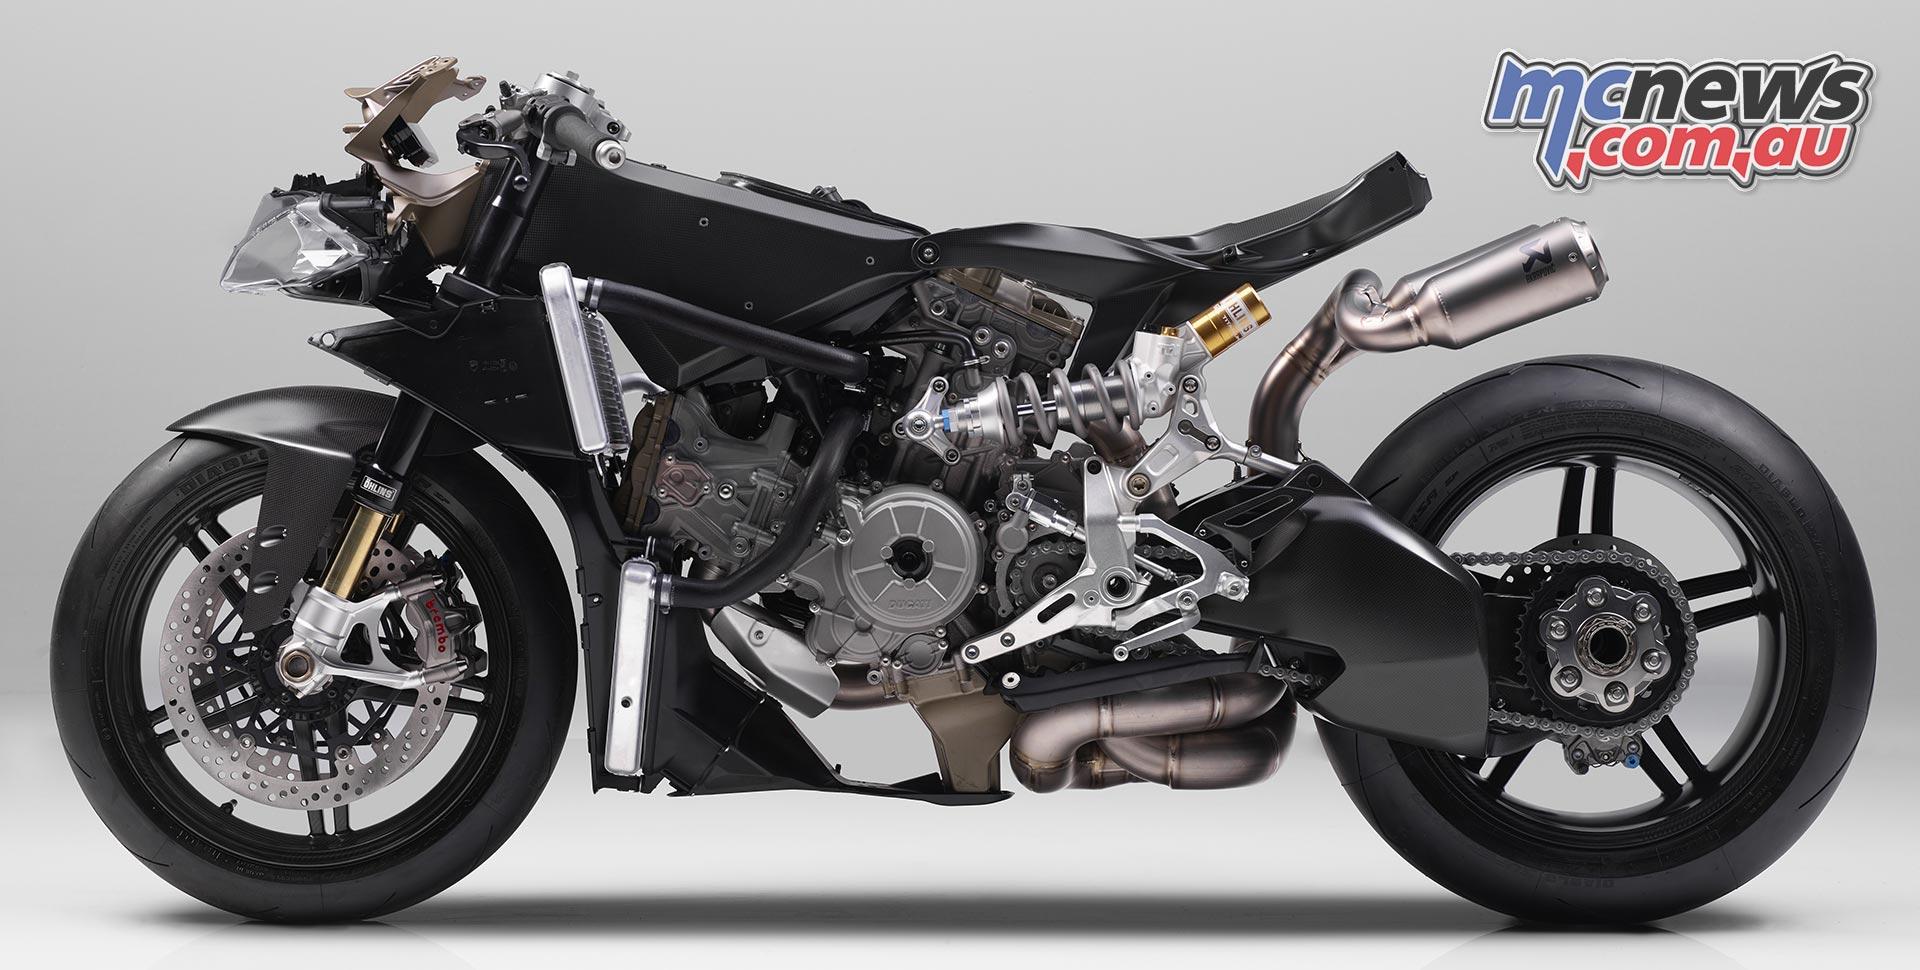 Ducati 1299 Superleggera   215hp   Carbon everything   MCNews.com.au